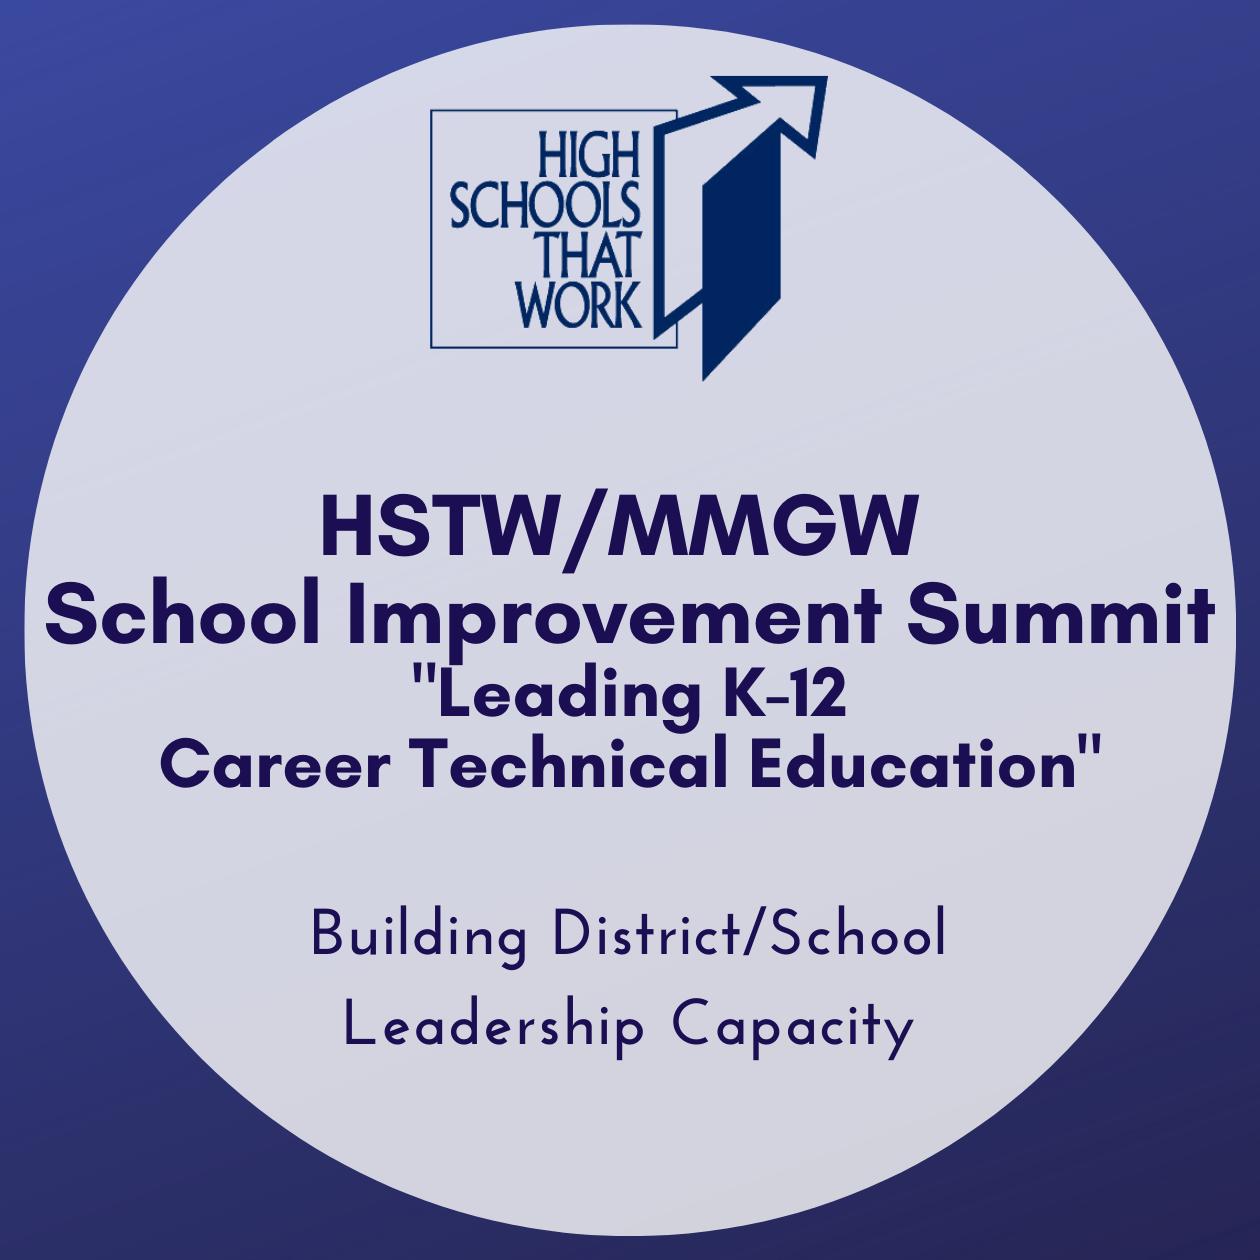 HSTW MMGW School Improvement Summit